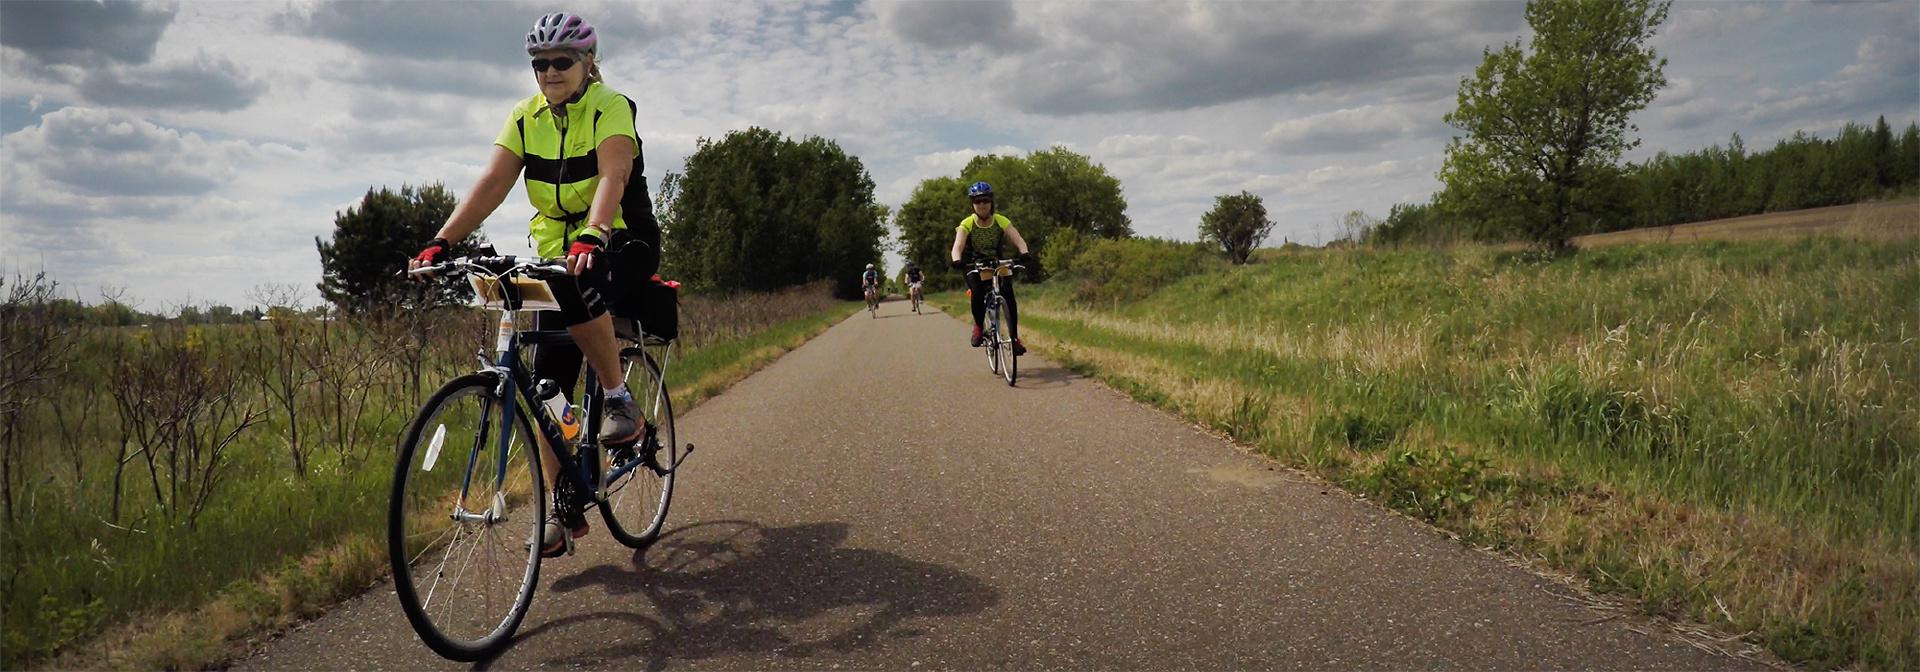 Minnesota: Lake Wobegon Trail